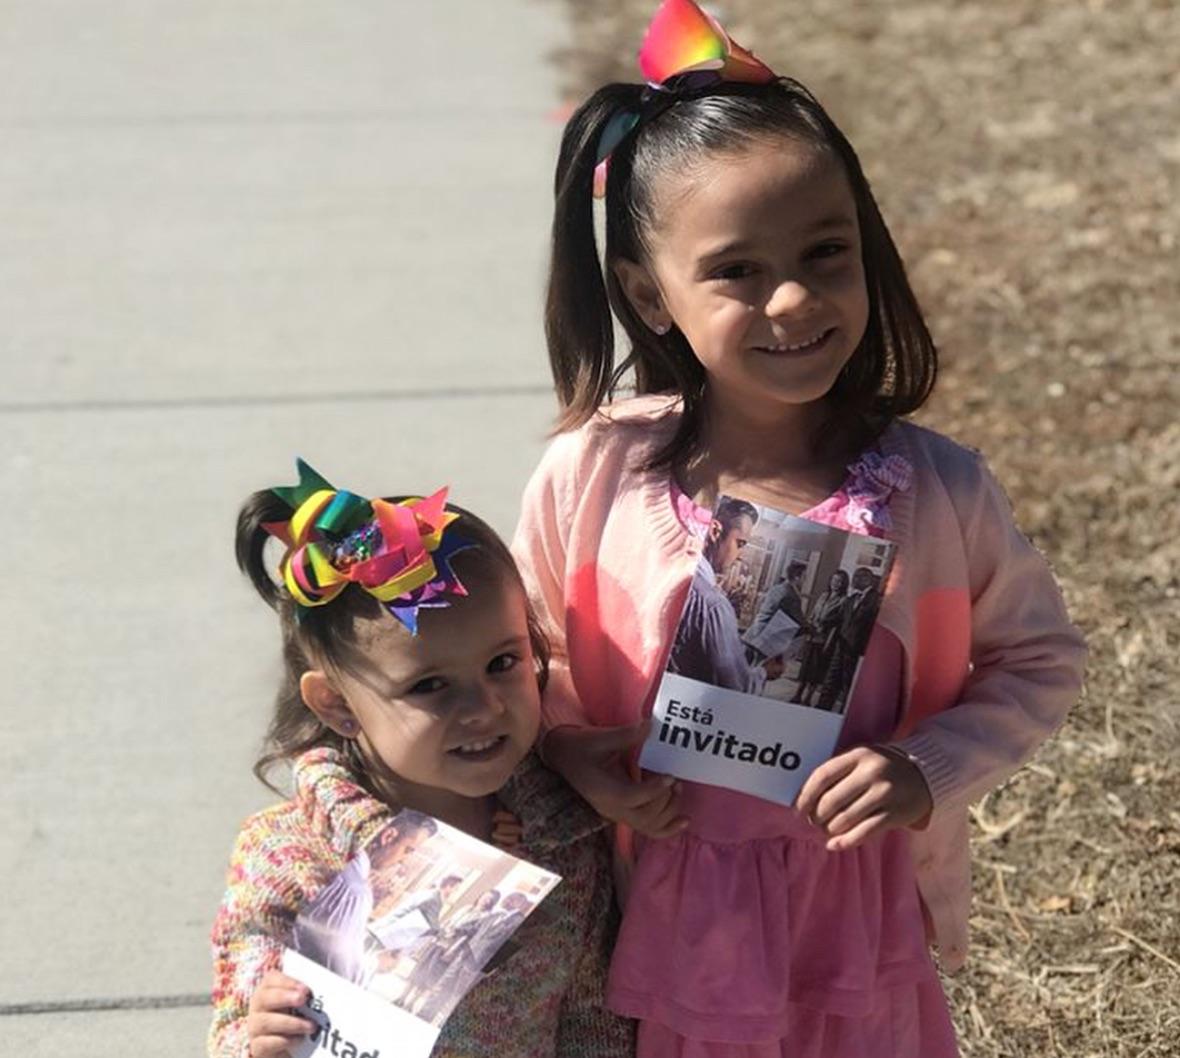 Allisson Lozano mira que grandes estan las hijas de allisson lozz | people